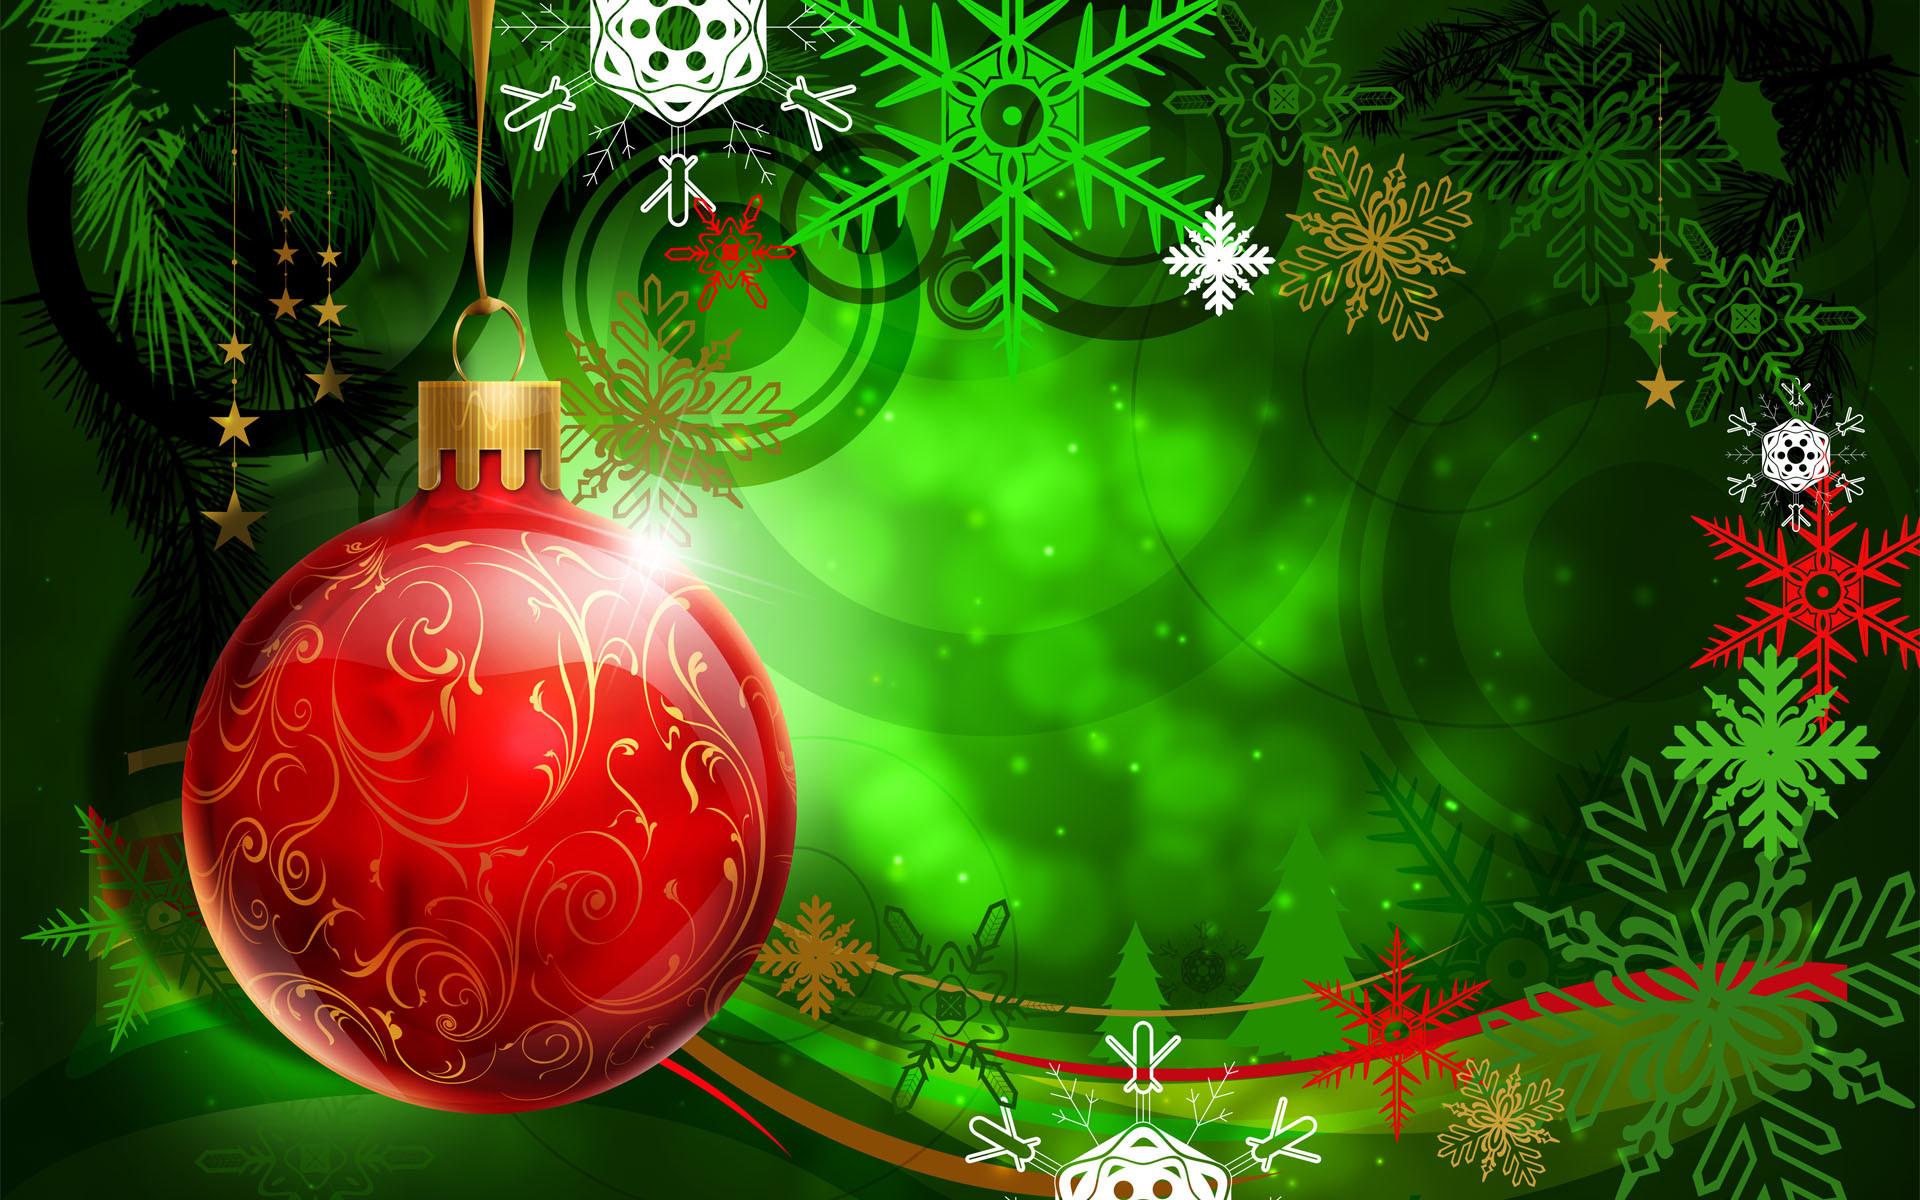 Christmas Wallpaper Screen Saver 65 images